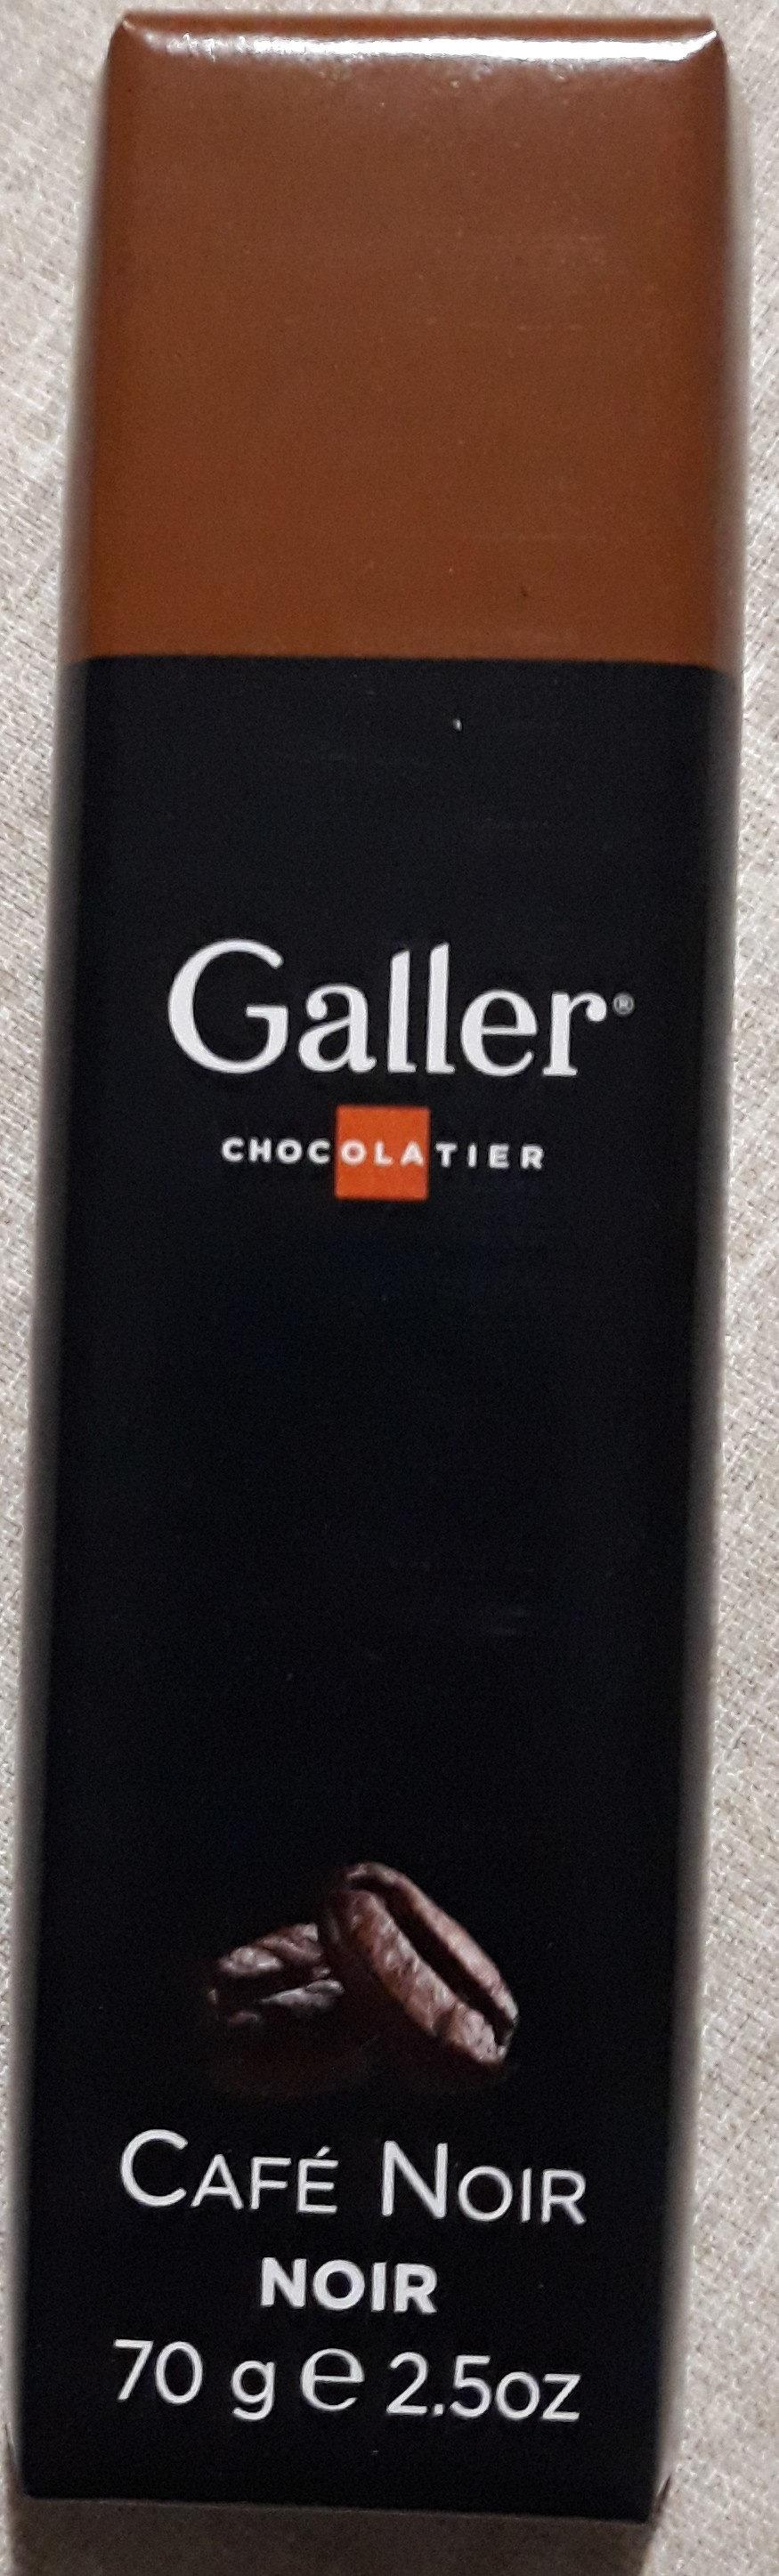 Bâton Galler Café-Noir - Produit - fr